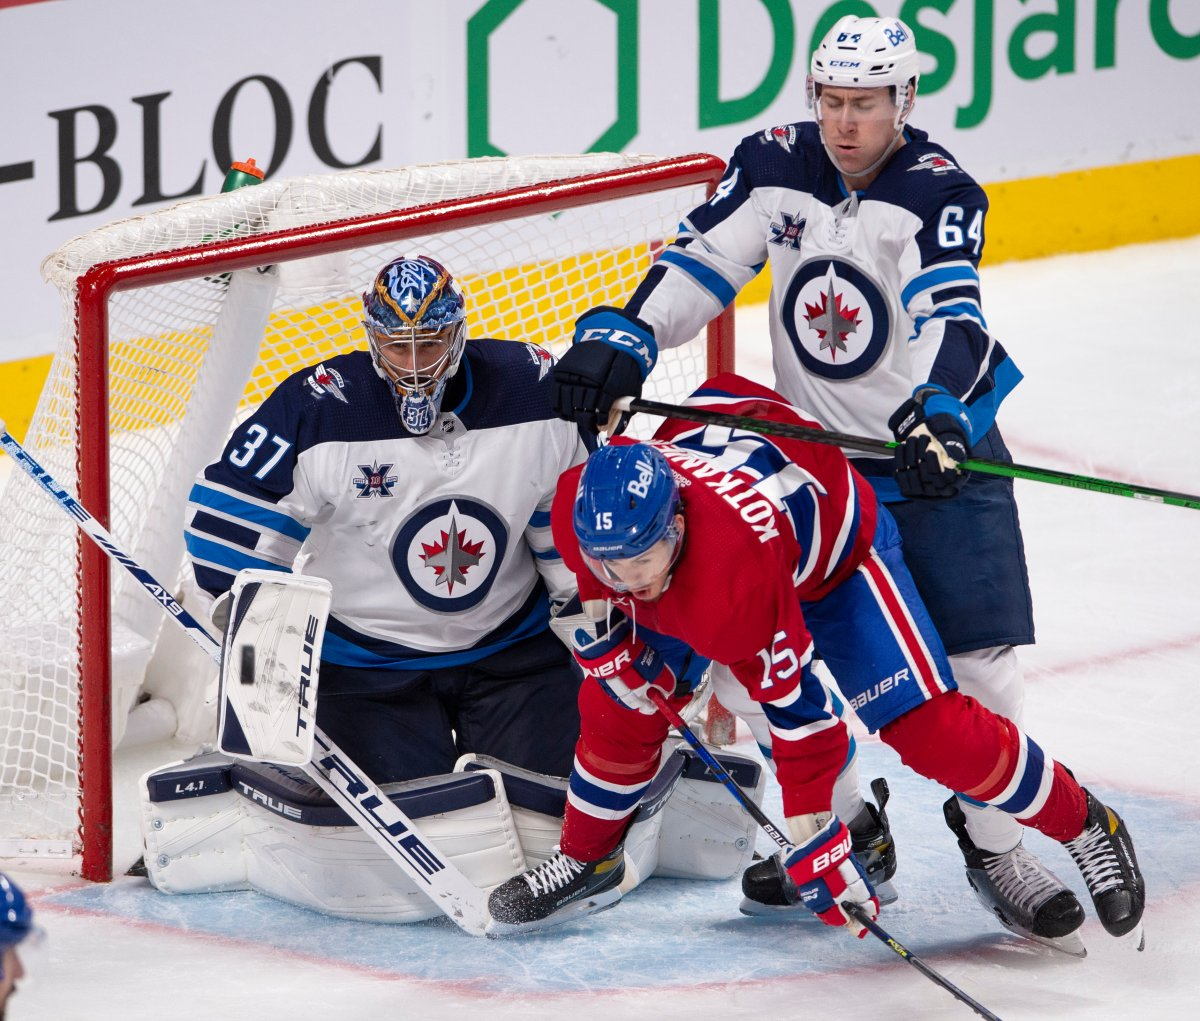 Winnipeg Jets' Logan Stanley (64) crosschecks Montreal Canadiens' Jesperi Kotkaniemi (15) in front of Jets goaltender Connor Hellebuyck (37) during third period NHL hockey action Thursday, April 8, 2021 in Montreal.